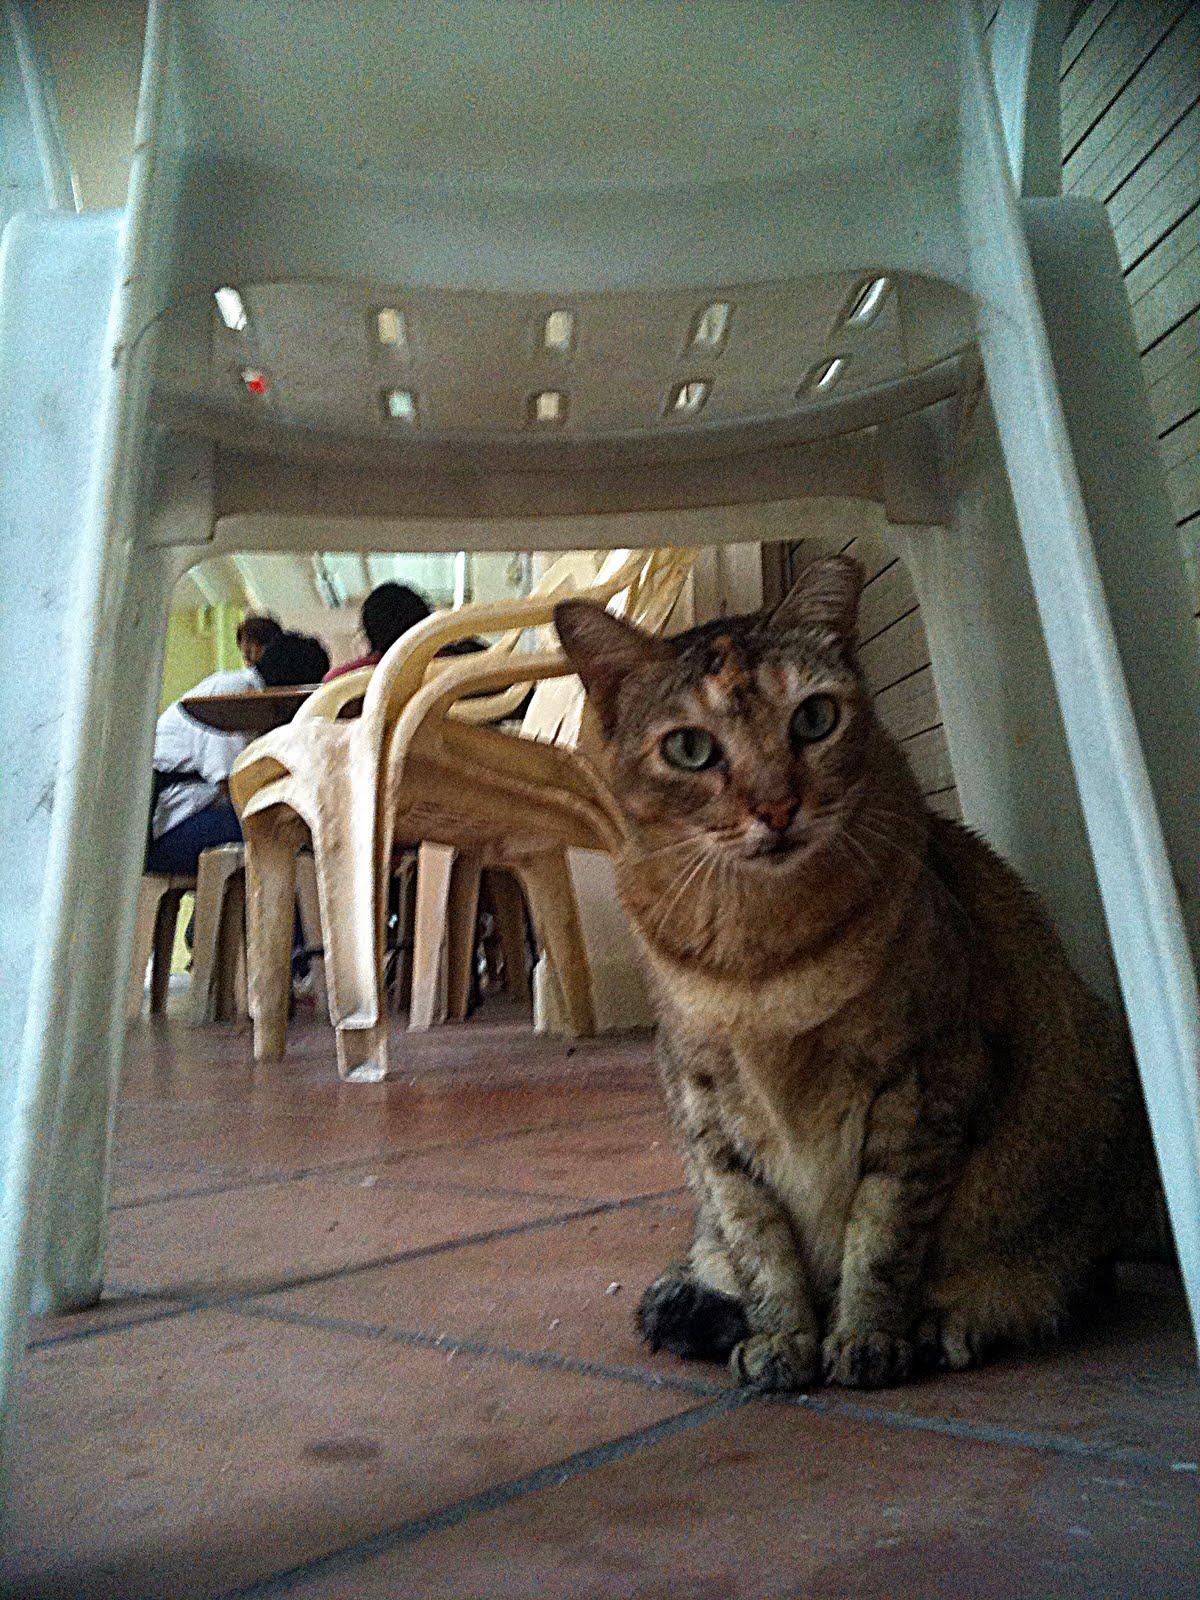 http://3.bp.blogspot.com/_2p4y0FR2tGU/TKCKiR4rYXI/AAAAAAAAEnI/pUNMGOV4IA4/s1600/community-cat_bedok-north_27092010.JPG